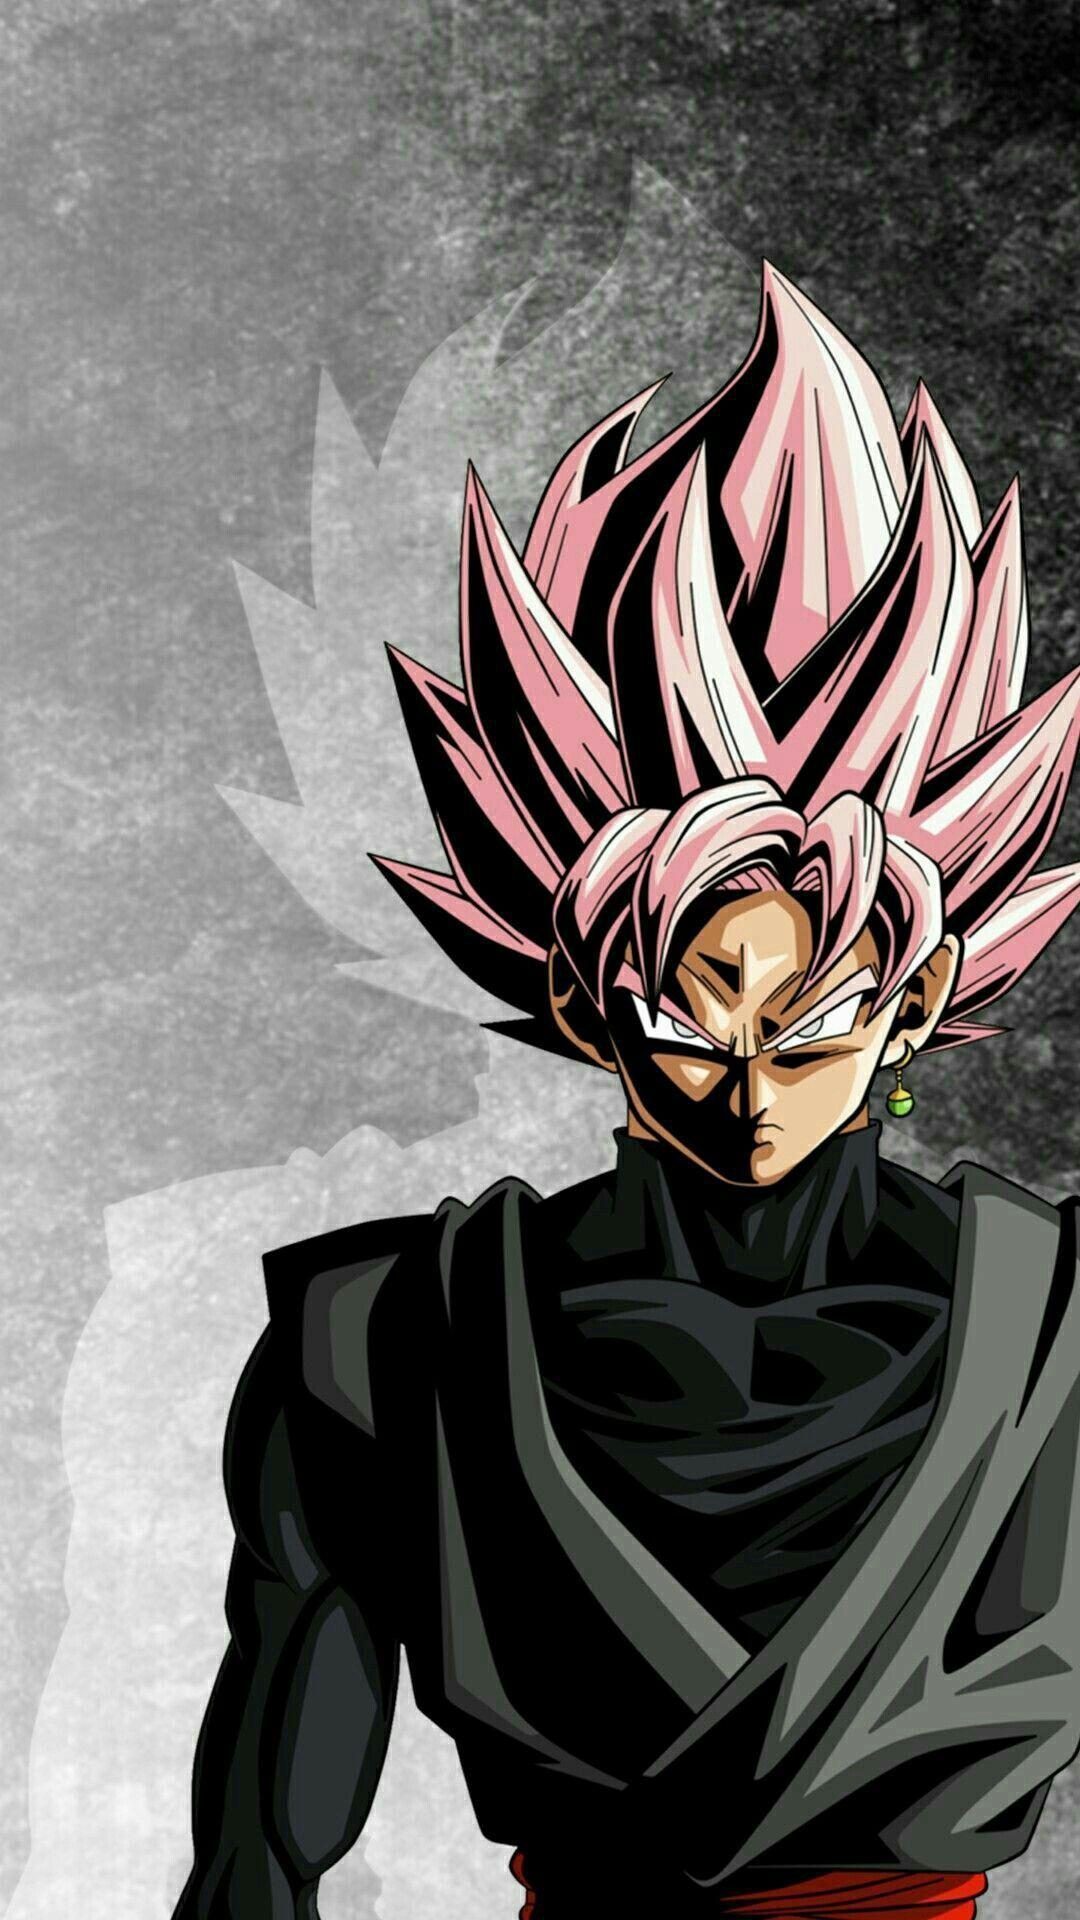 Dragon Ball Super Black Goku Hd Wallpapers Kadadaorg